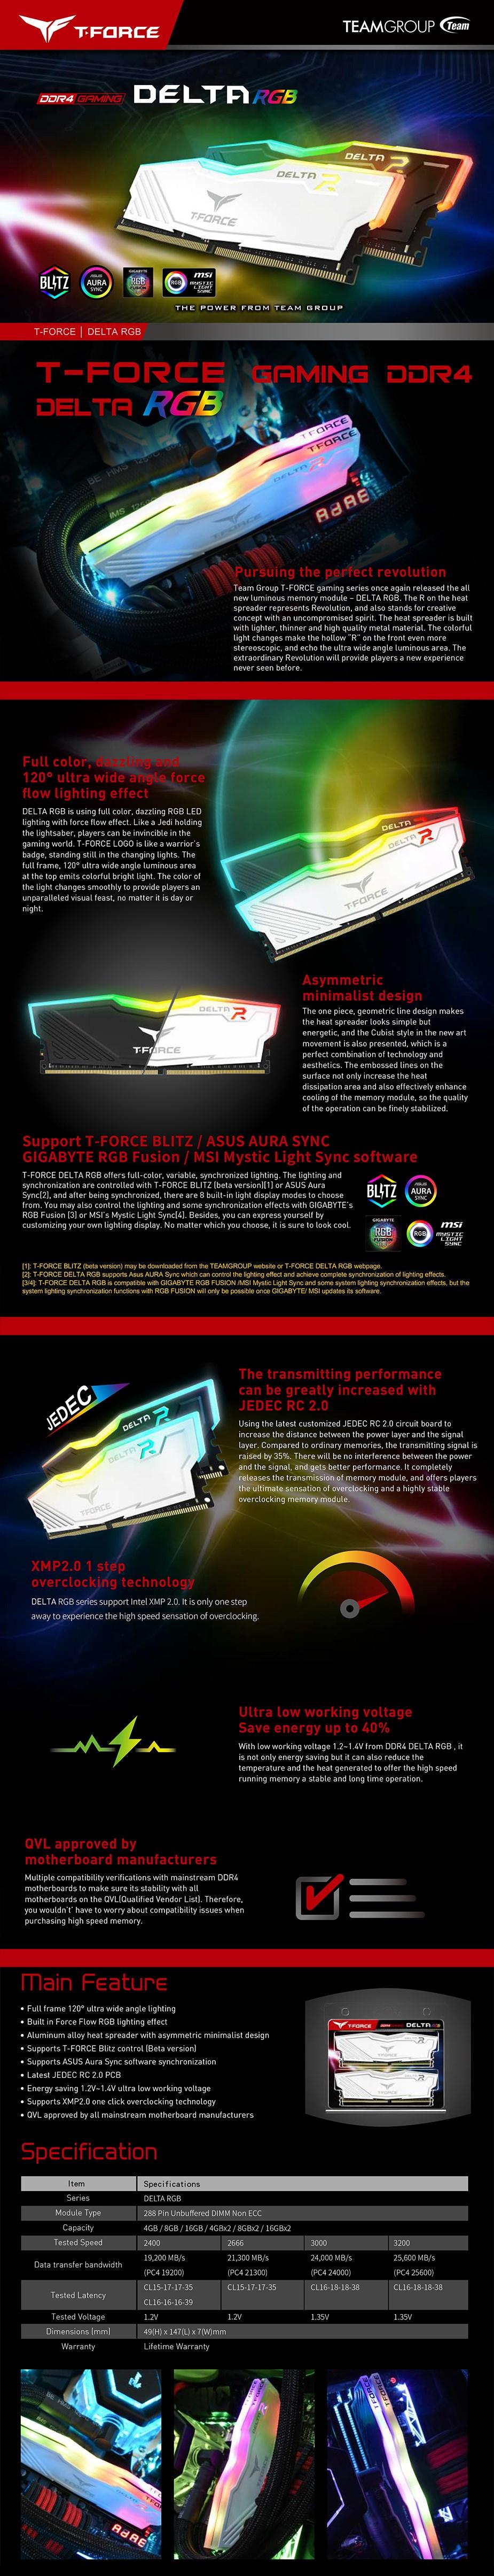 Team T-Force Delta RGB Series 16GB (2x 8GB) DDR4 3200MHz Memory - Black - Overview 1